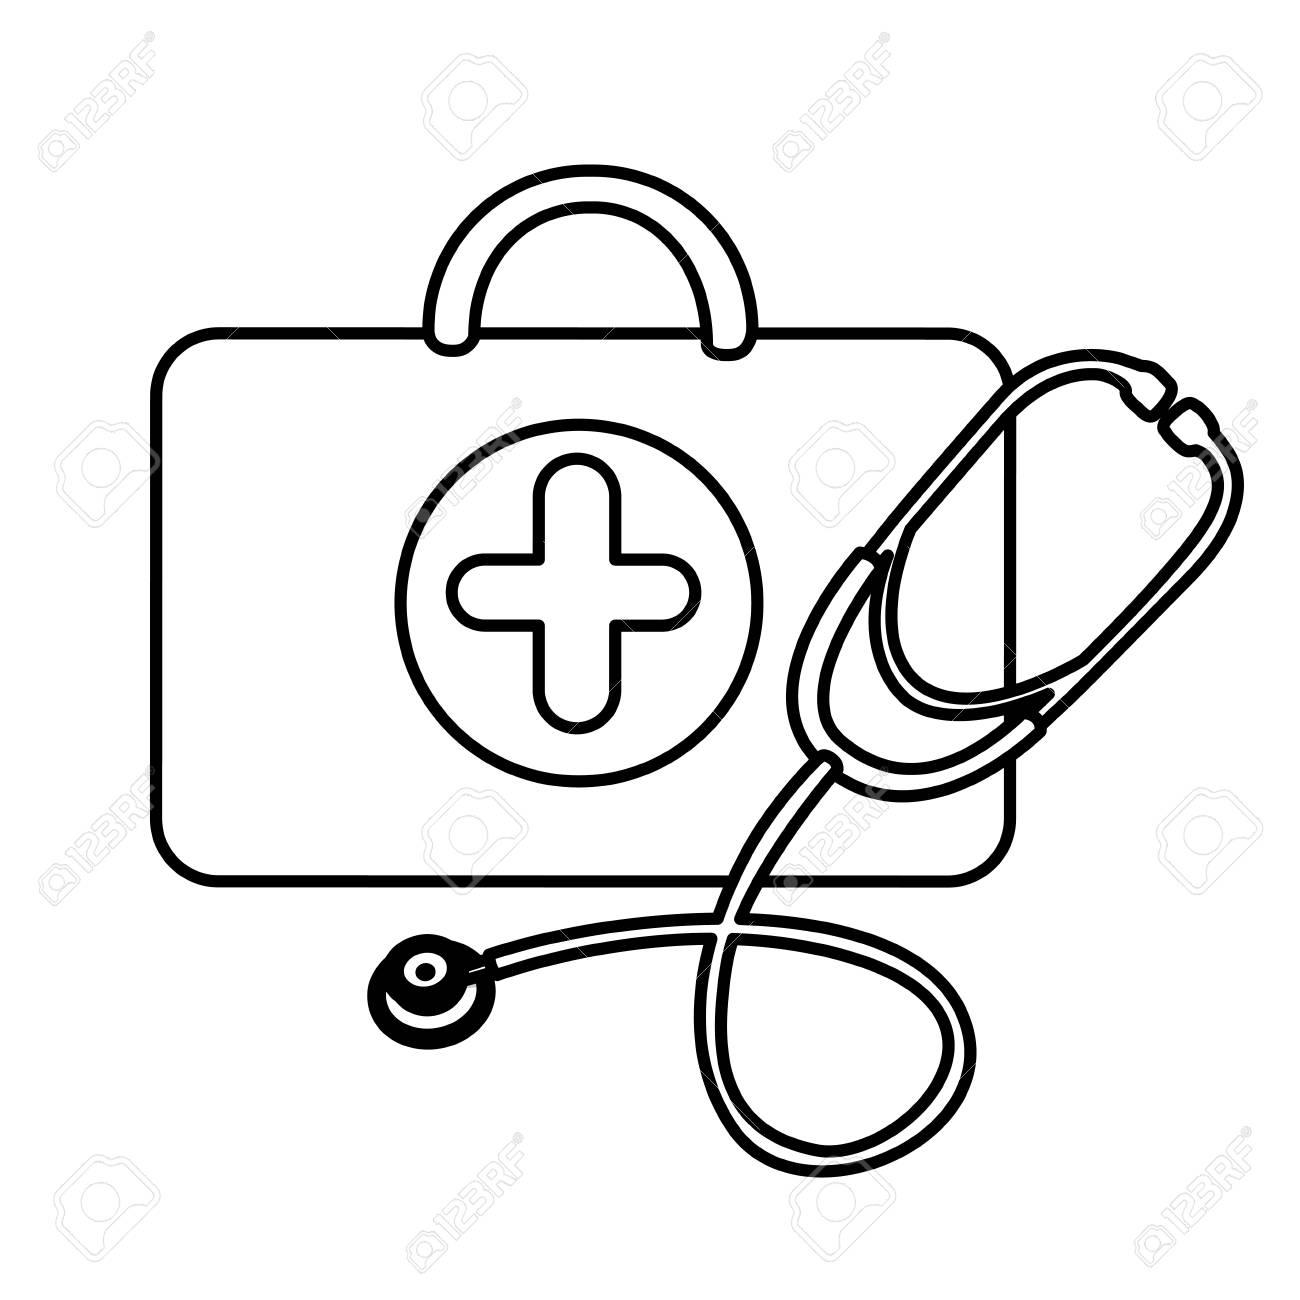 Dessin Stéthoscope santé de valise silhouette avec icône de stéthoscope, dessin